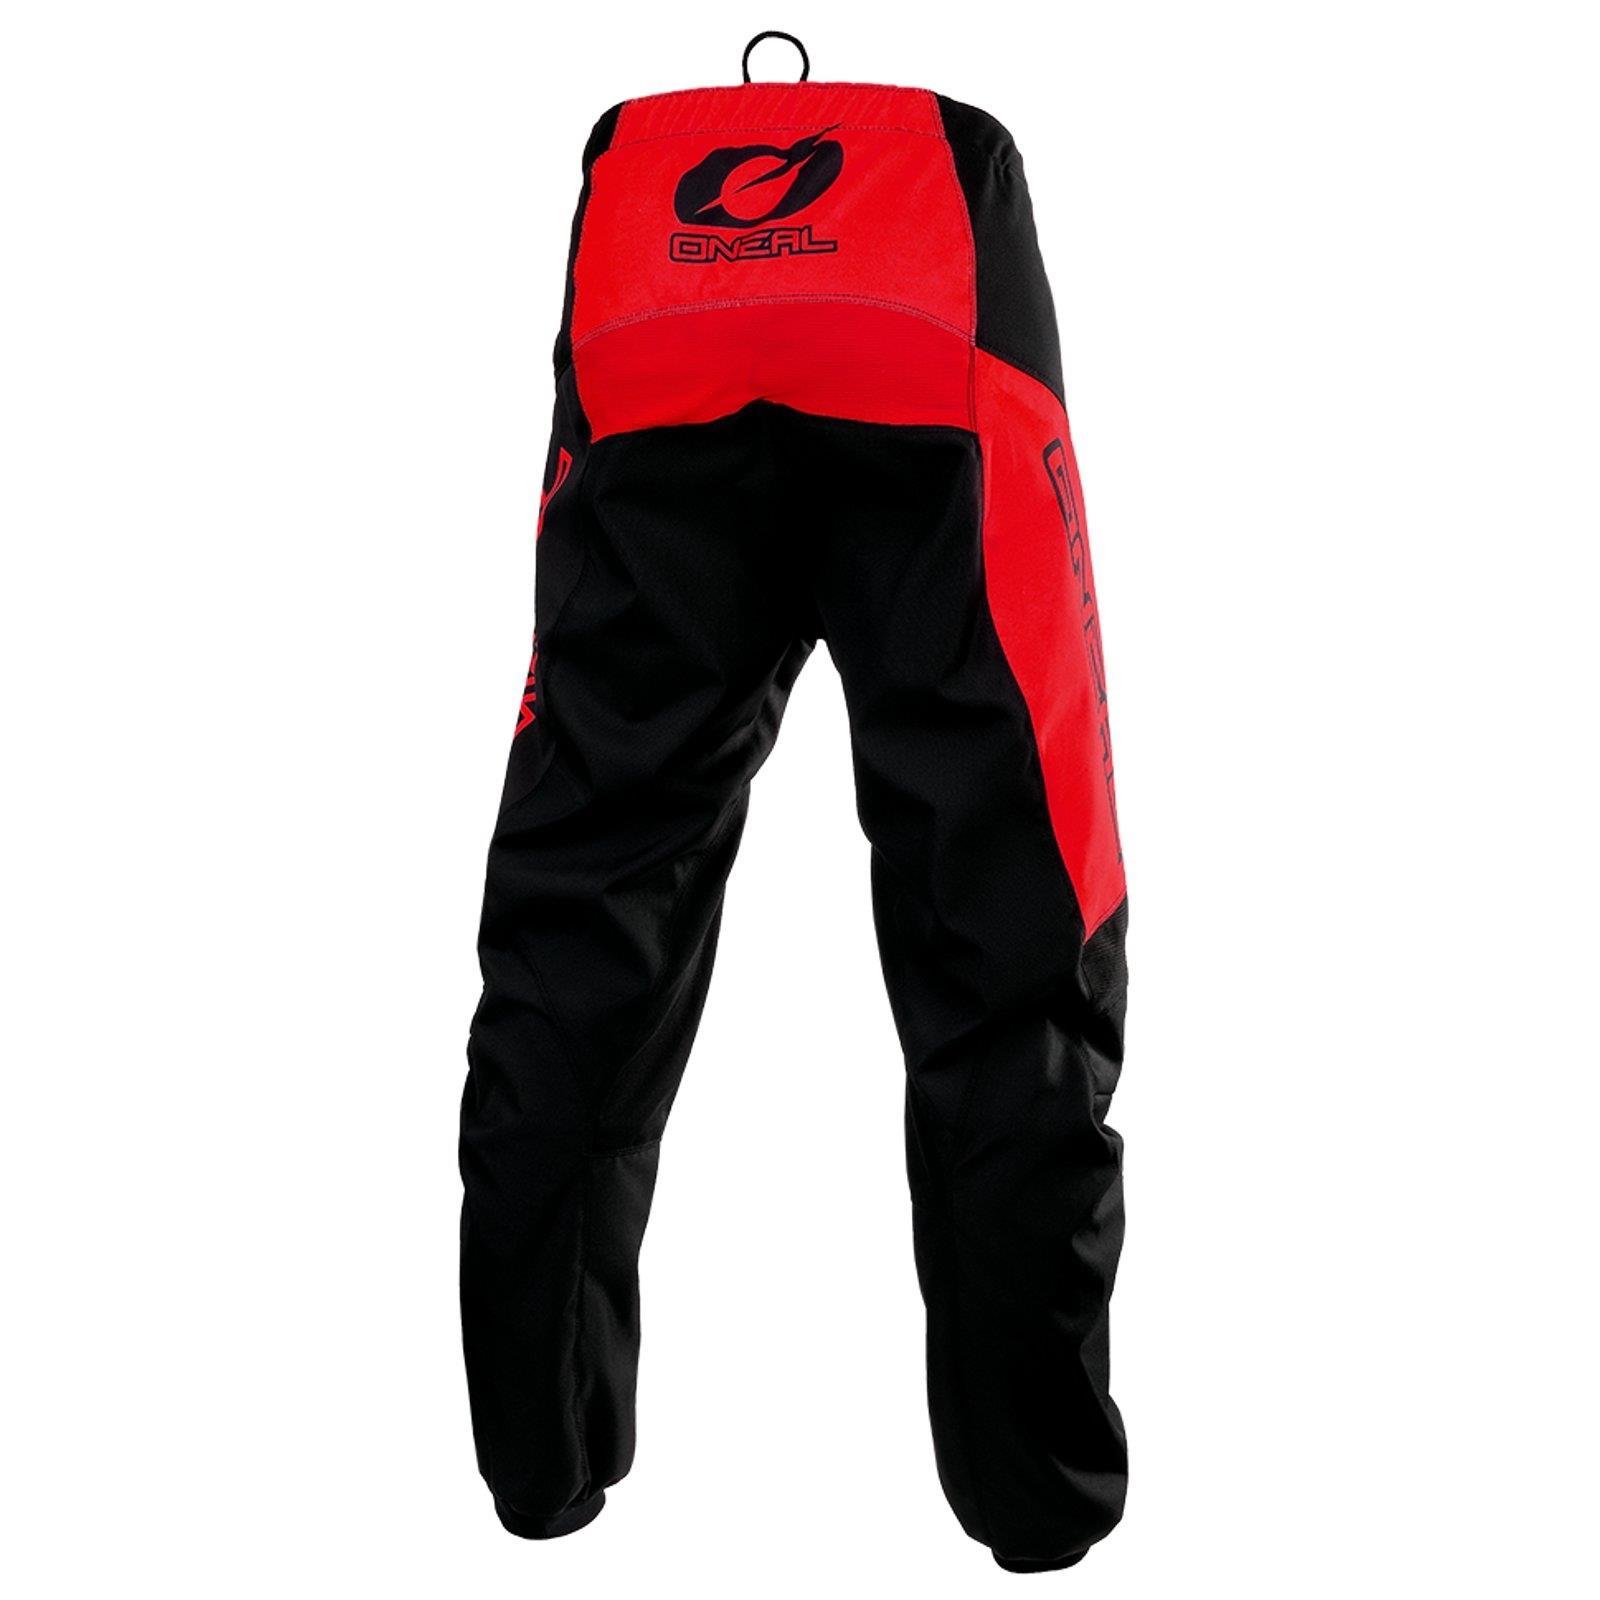 Oneal-elemento-Mayhem-Hardwear-Pants-pantalones-MX-DH-FR-Moto-Cross-Enduro-MTB-moto miniatura 21